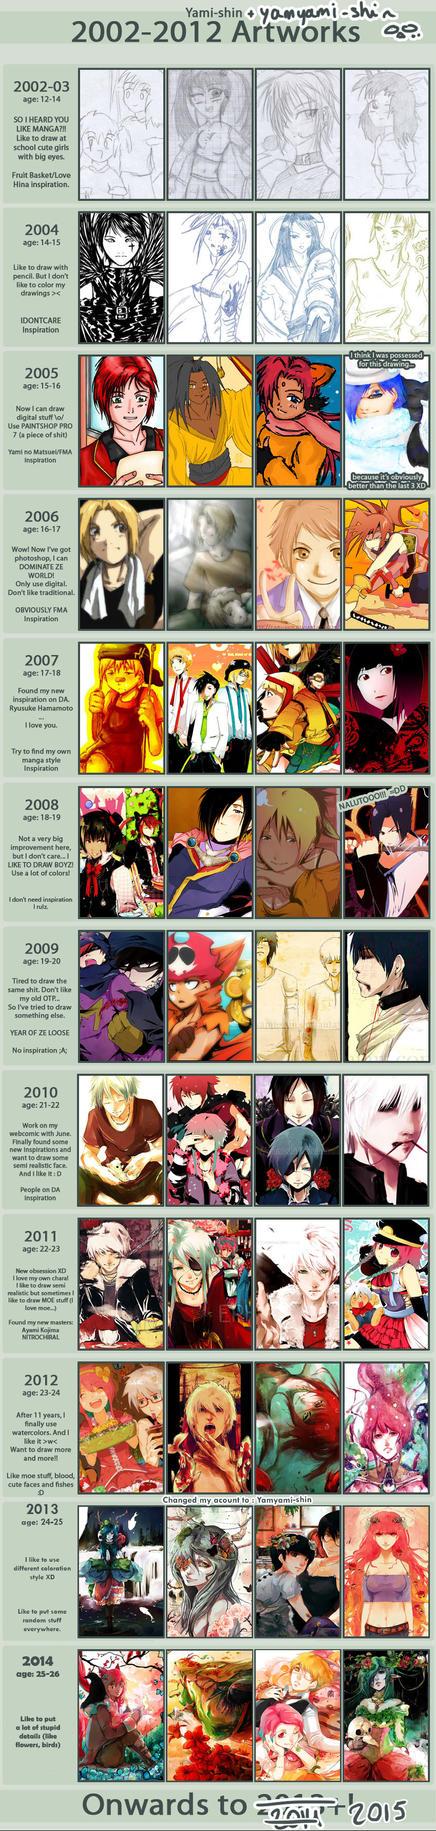 MEME IMPROVEMENT 2002-2014 by YamYami-Shin